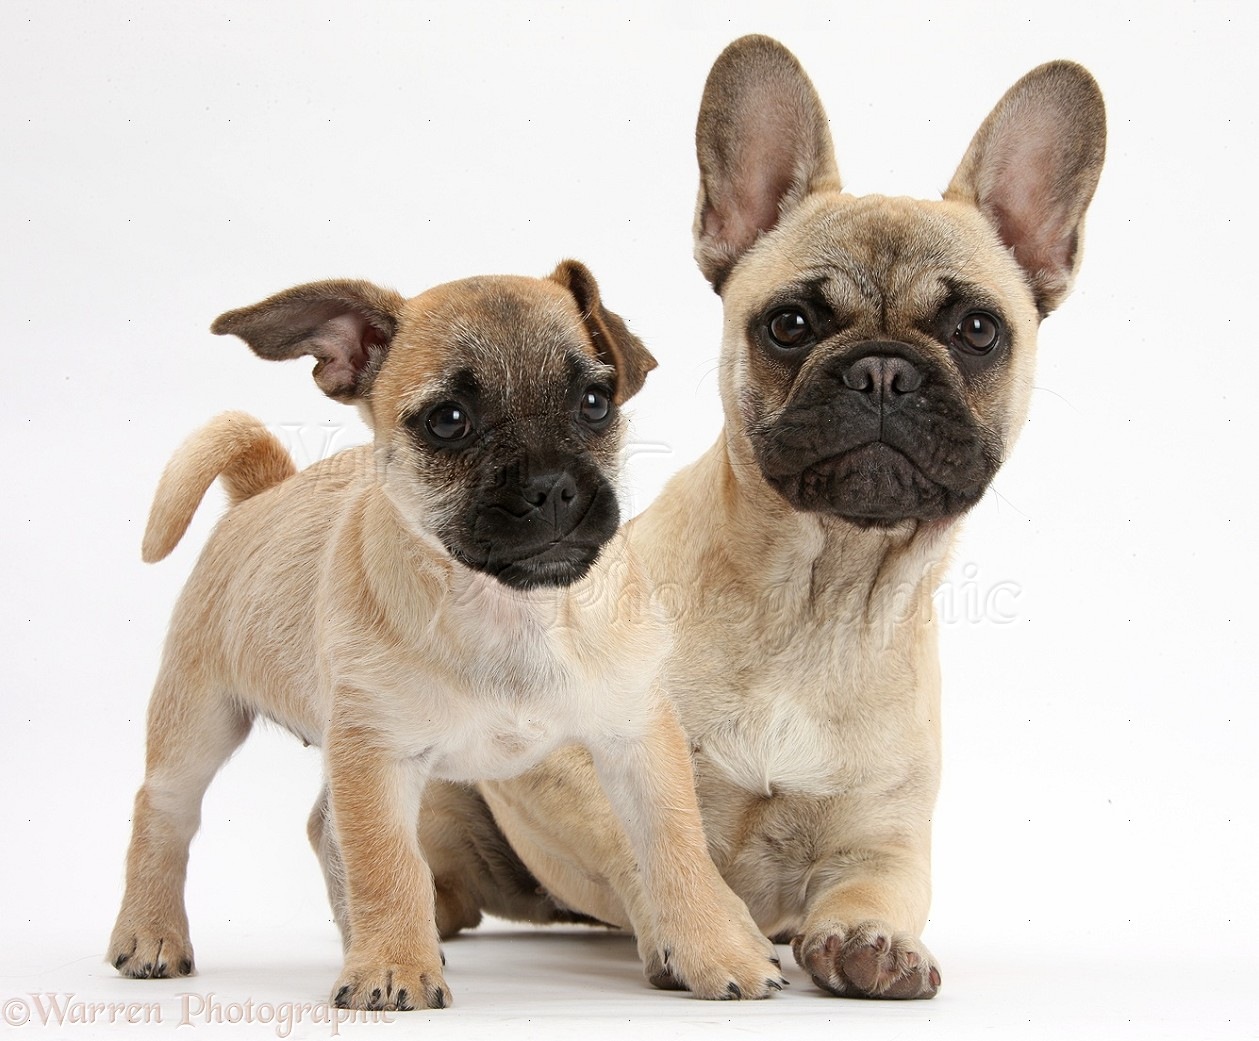 Jug Puppy Pug X Jack Russell And French Bulldog Photo Wp40114